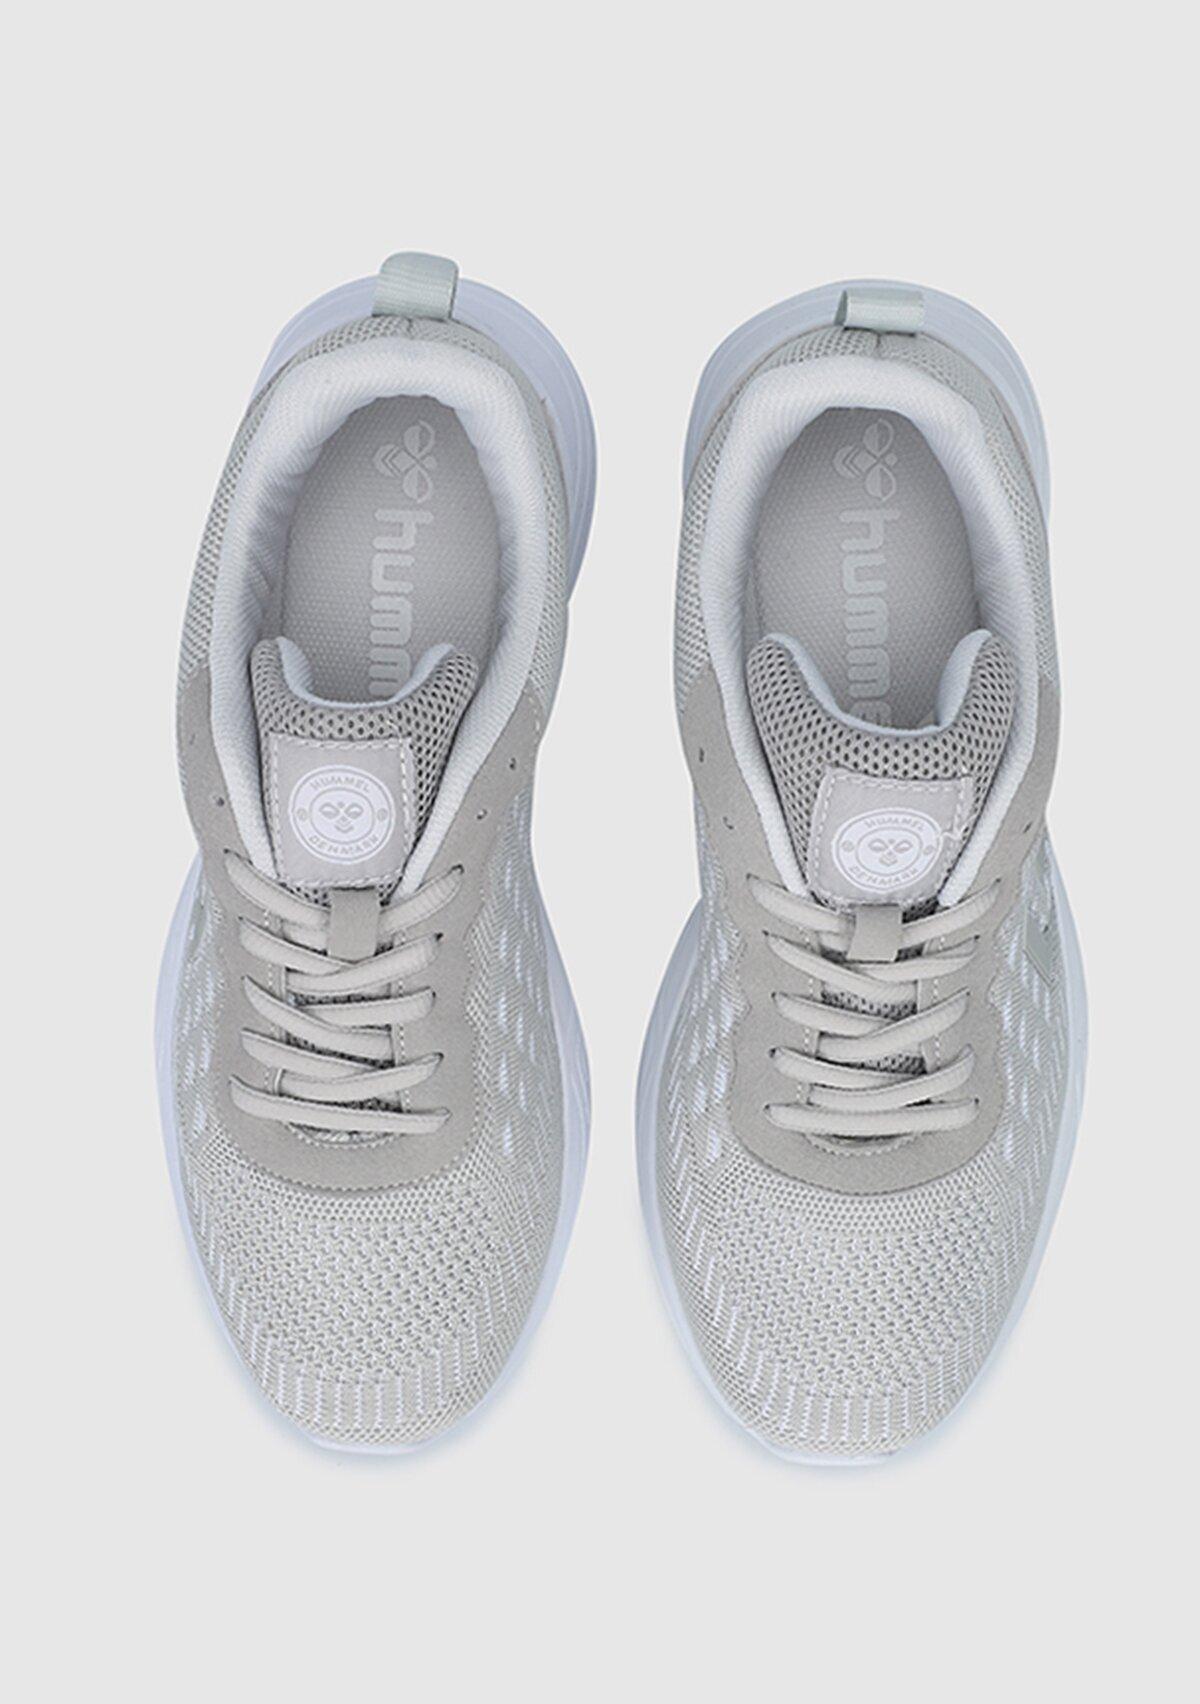 resm Hml Armin Gri Unisex Sneaker 212600-2003